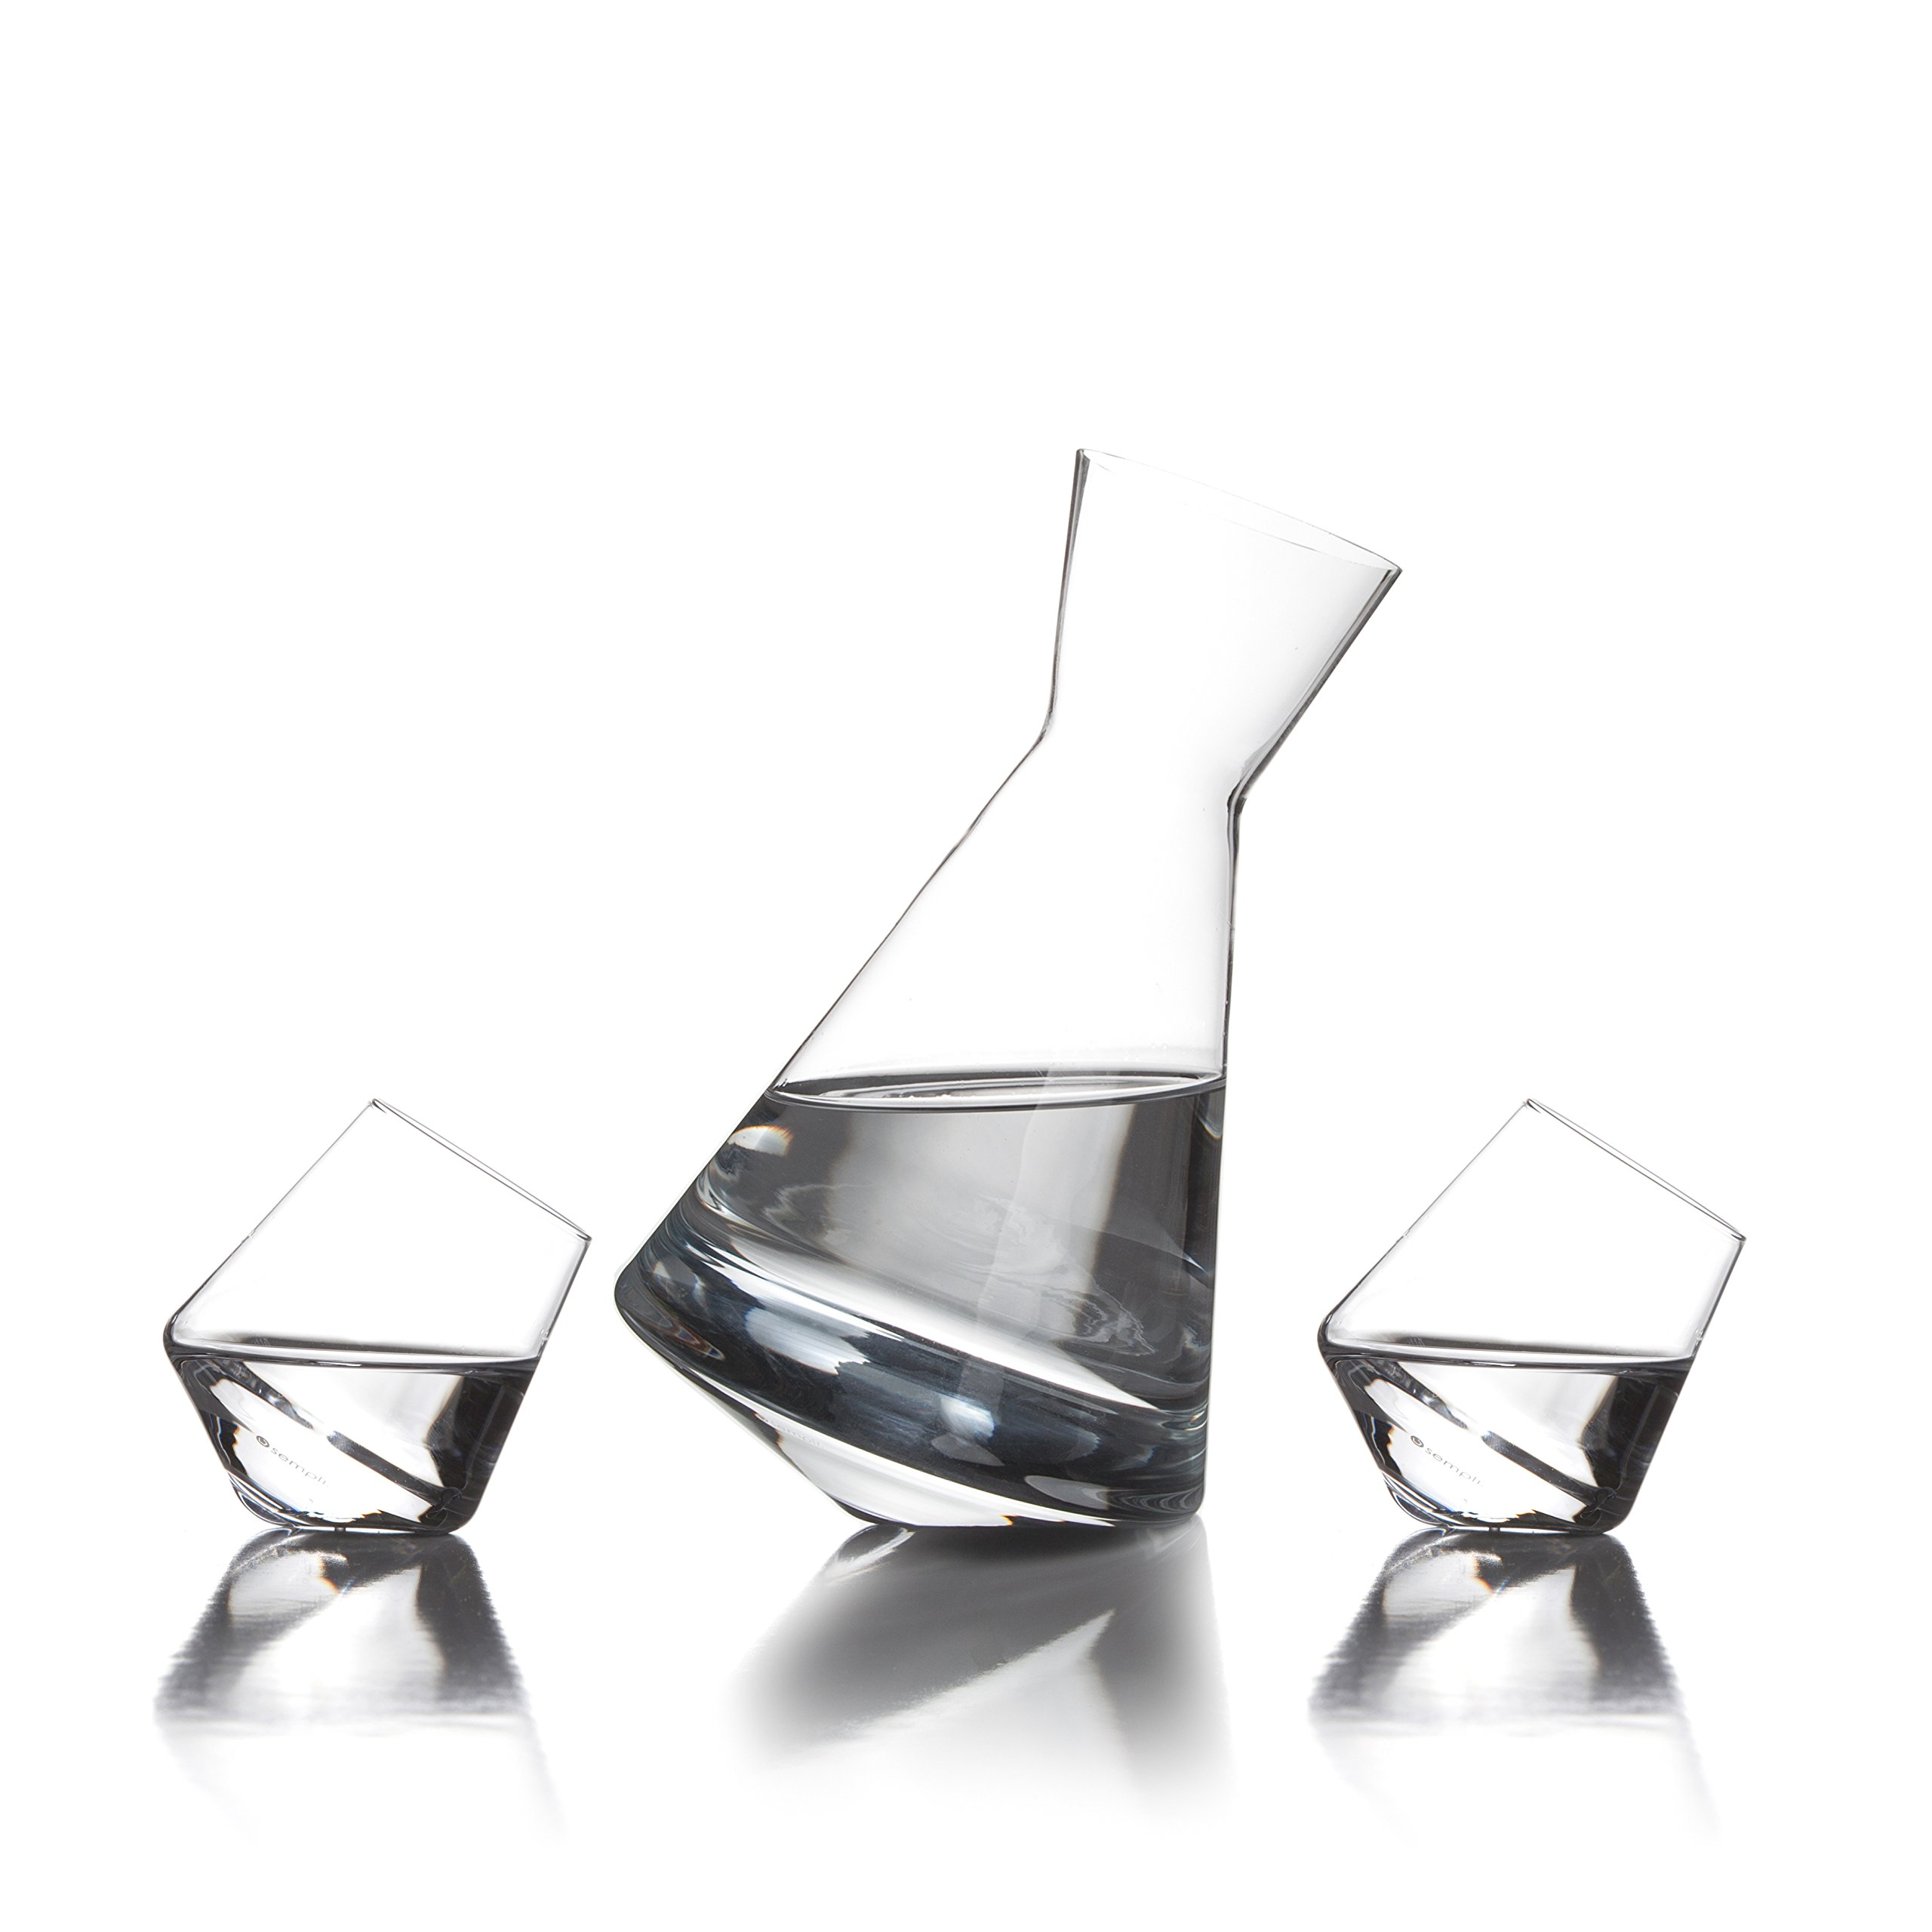 Sempli Vaso-Sake Set, Clear Decanter and 2 Shots in Gift Box